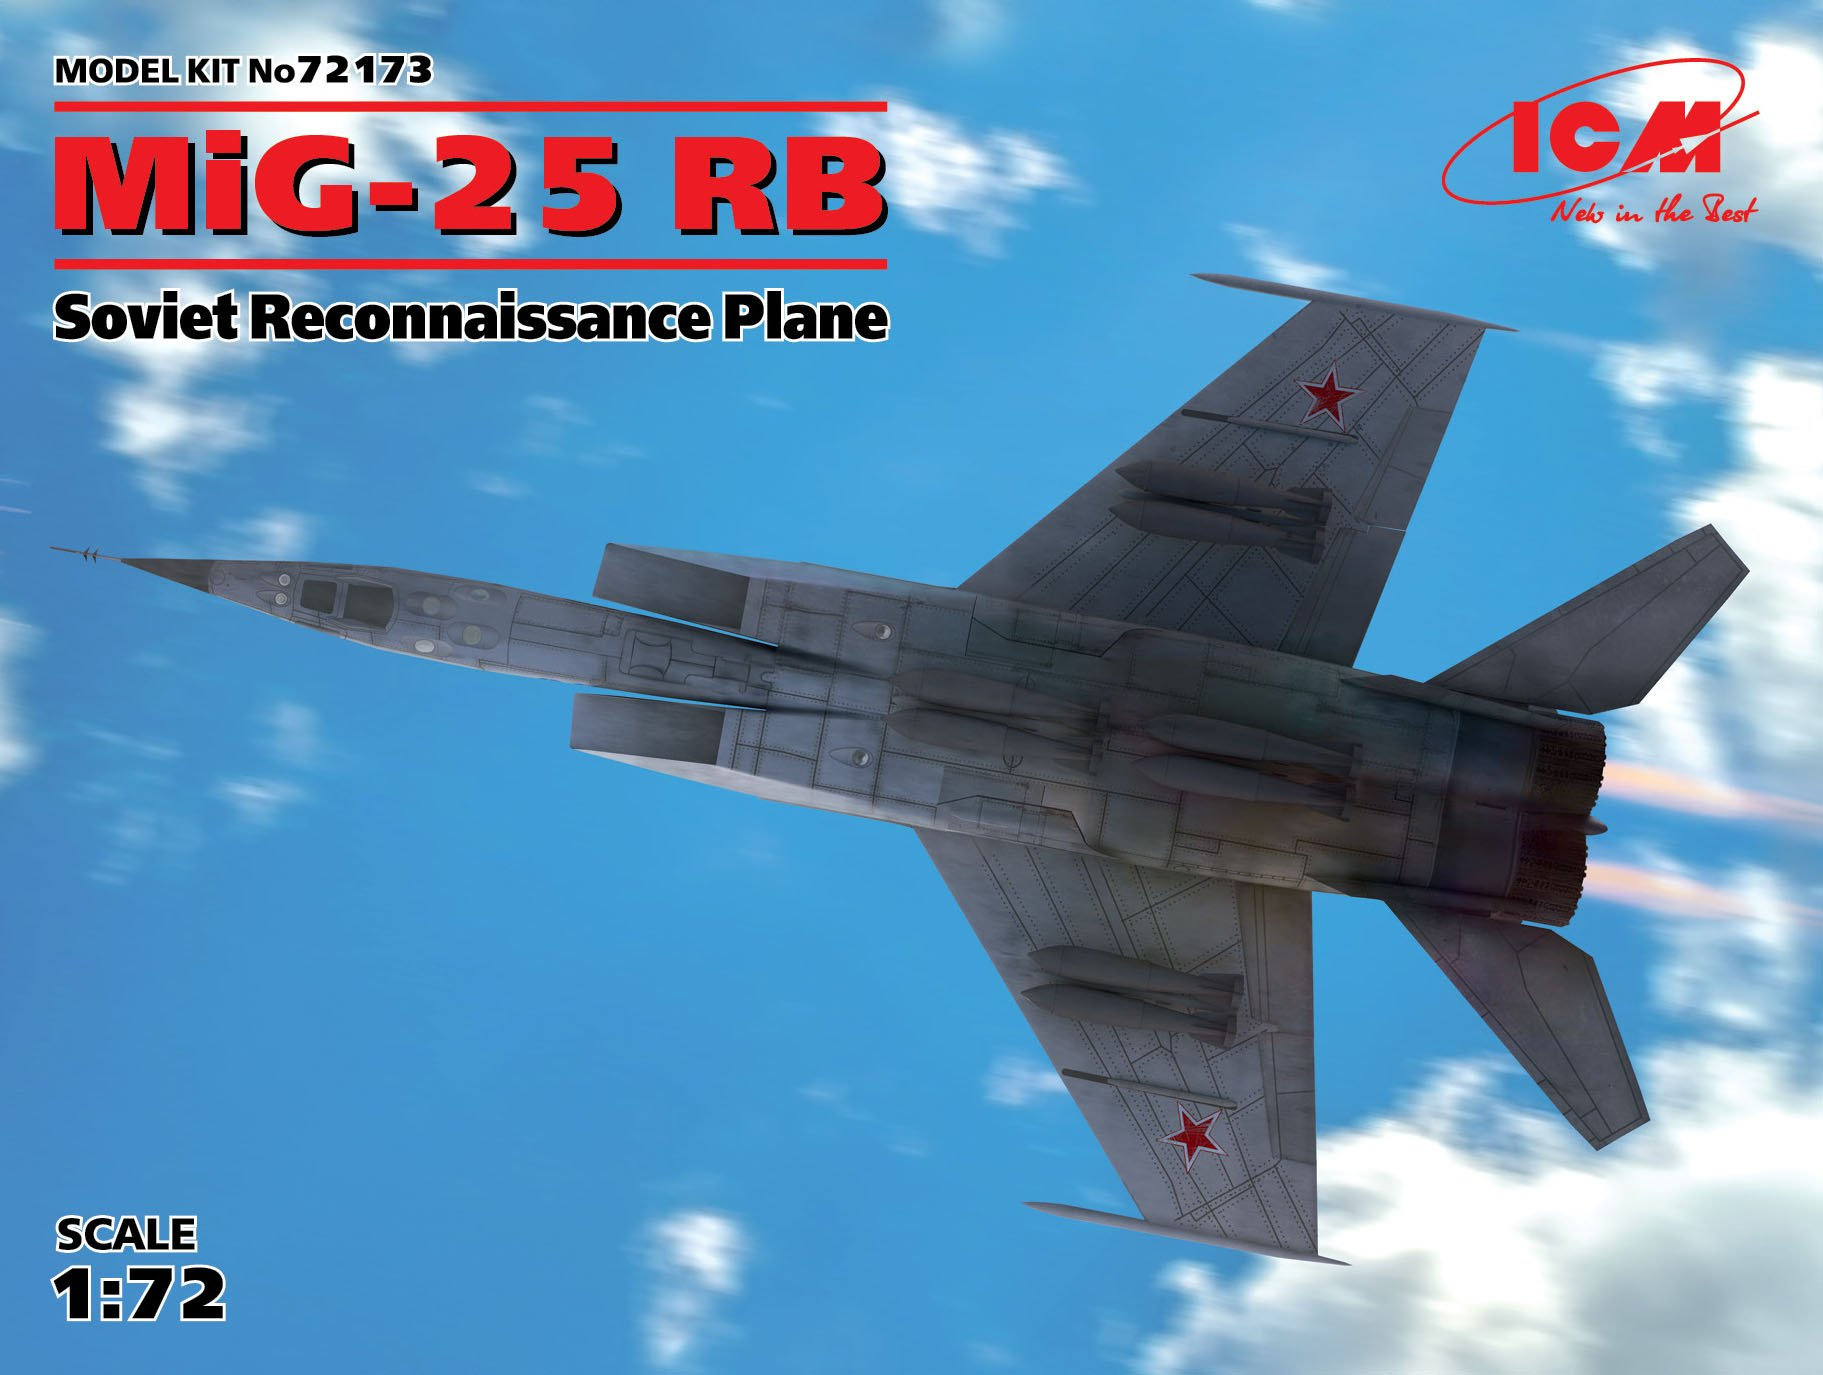 ICM MiG-25 RB, Soviet Reconnaissance Plane